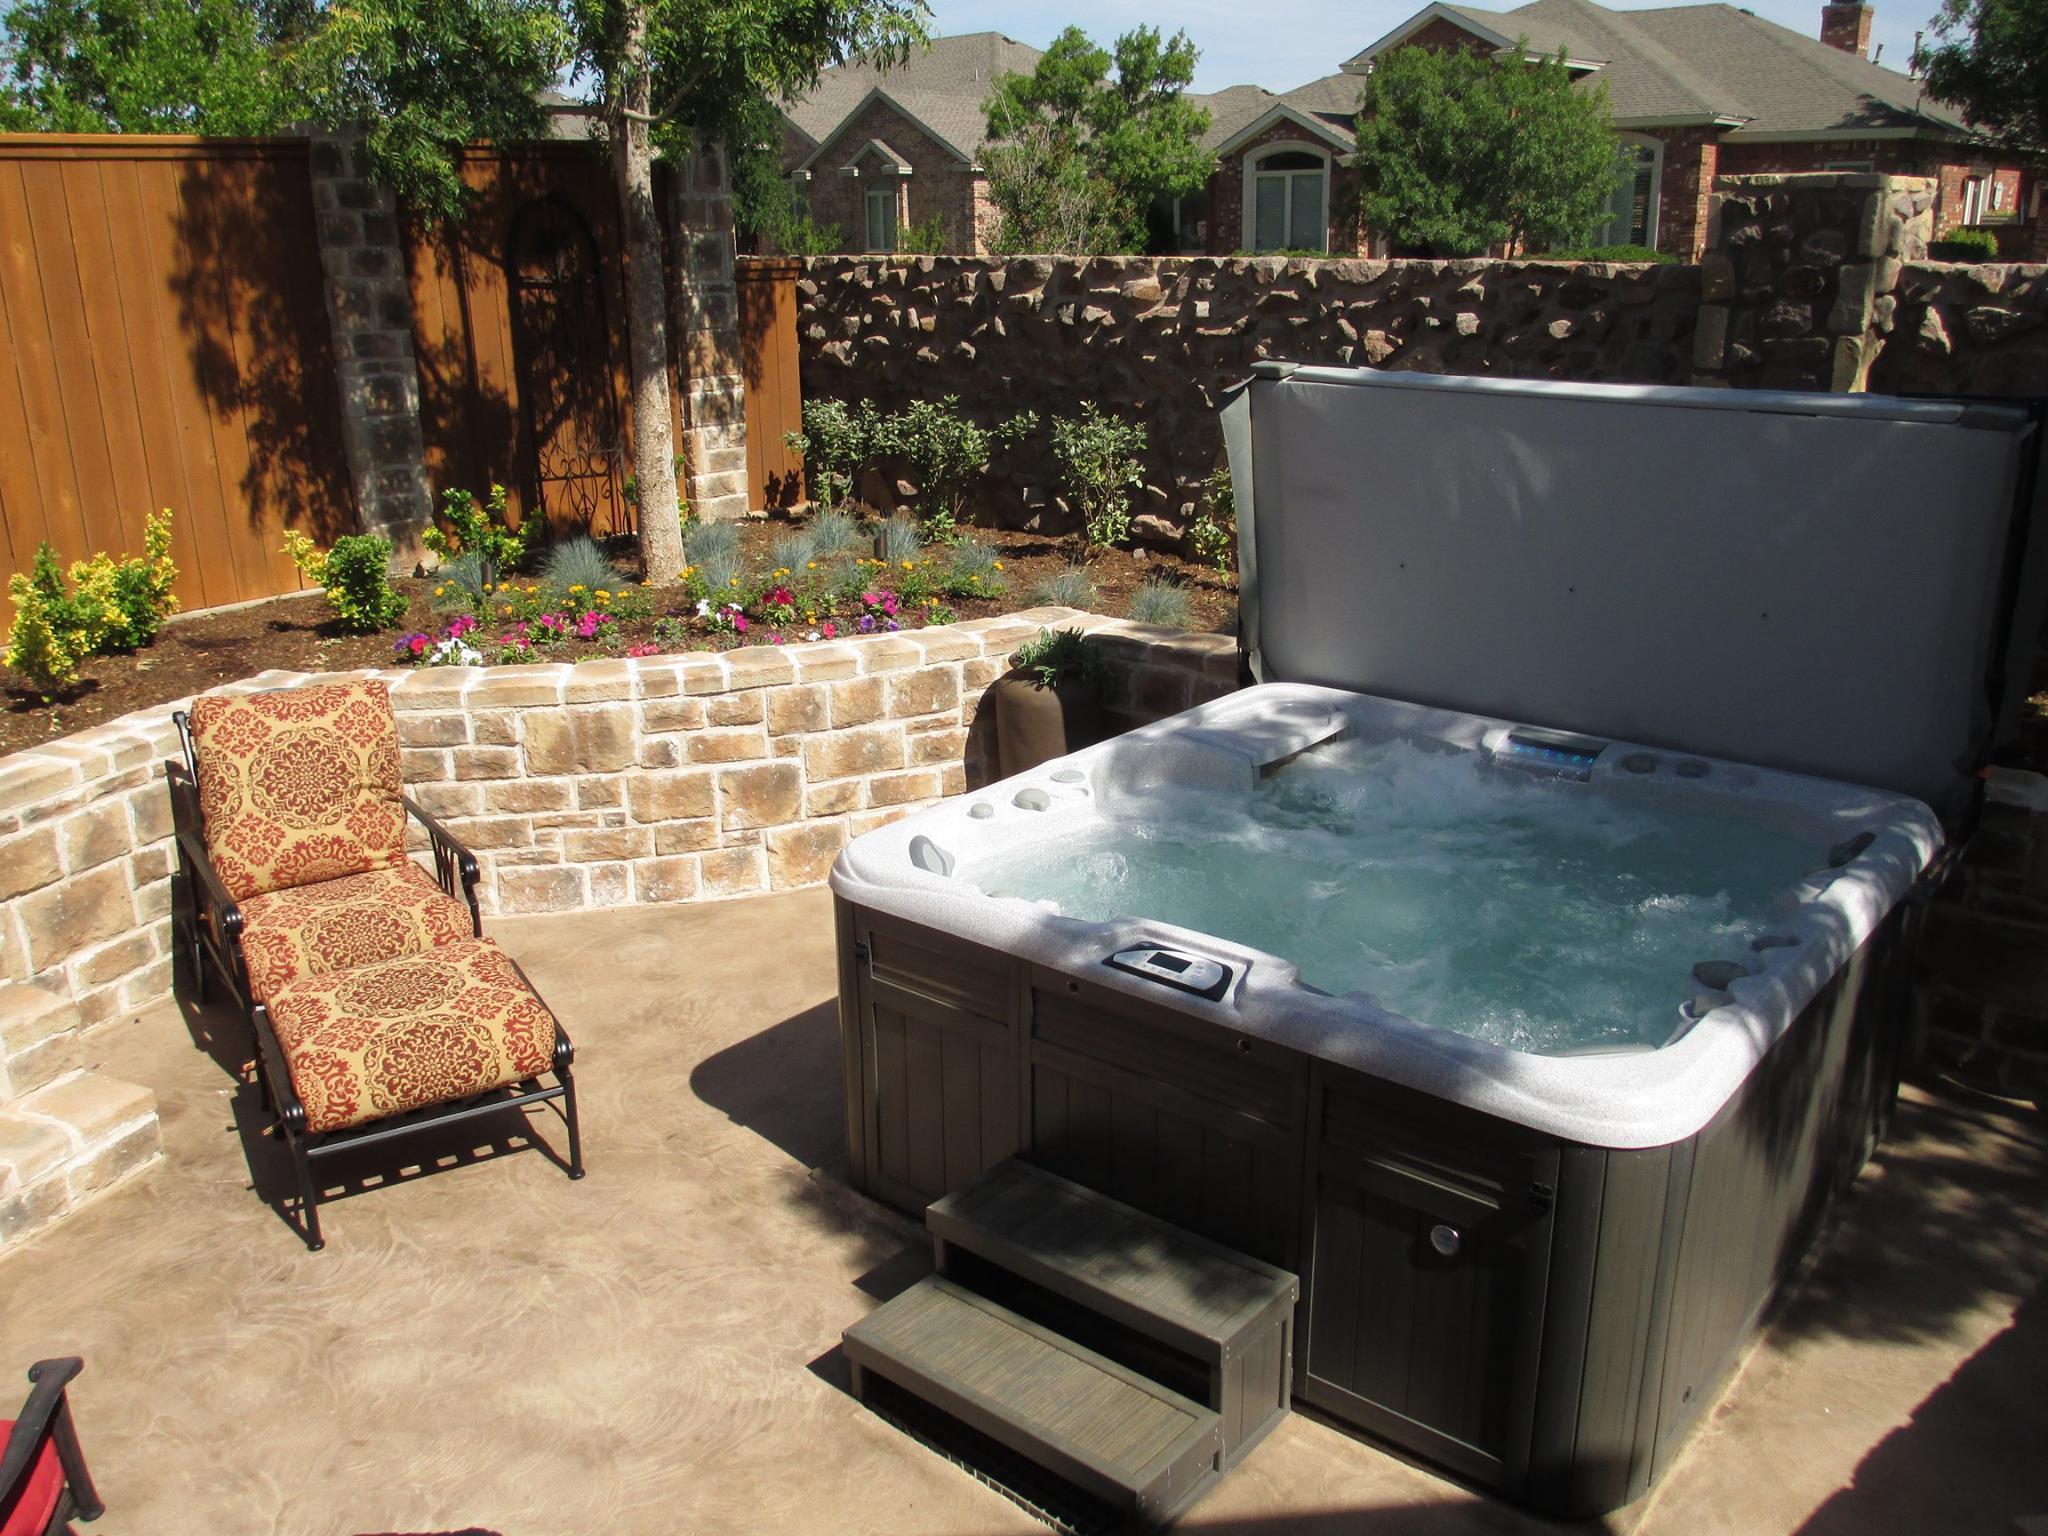 Alcoe lubbock texas tx - Swimming pool supplies lubbock tx ...